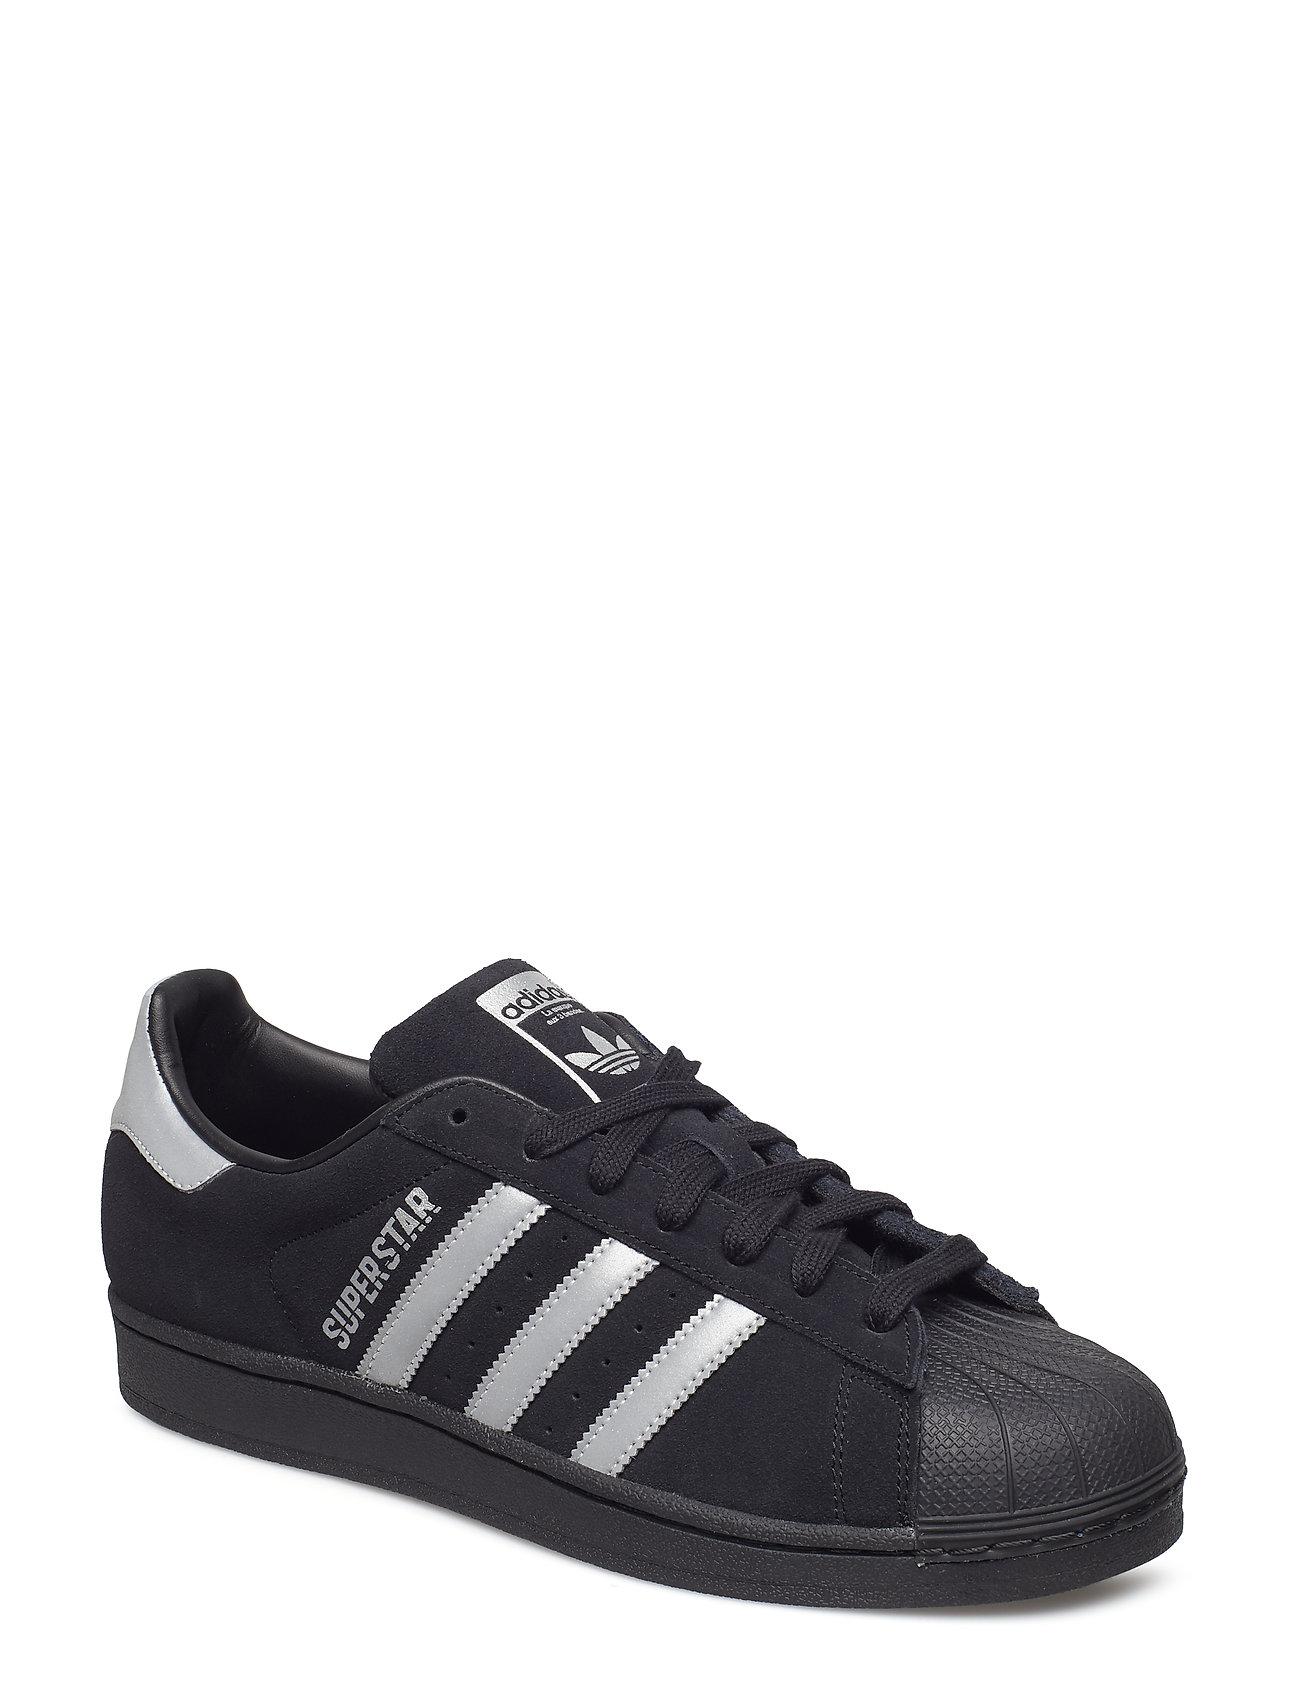 sneakers for cheap 33f32 52514 Adidas-originals ALE netistä   Nyt jopa -60%   SPOT-A-SHOP